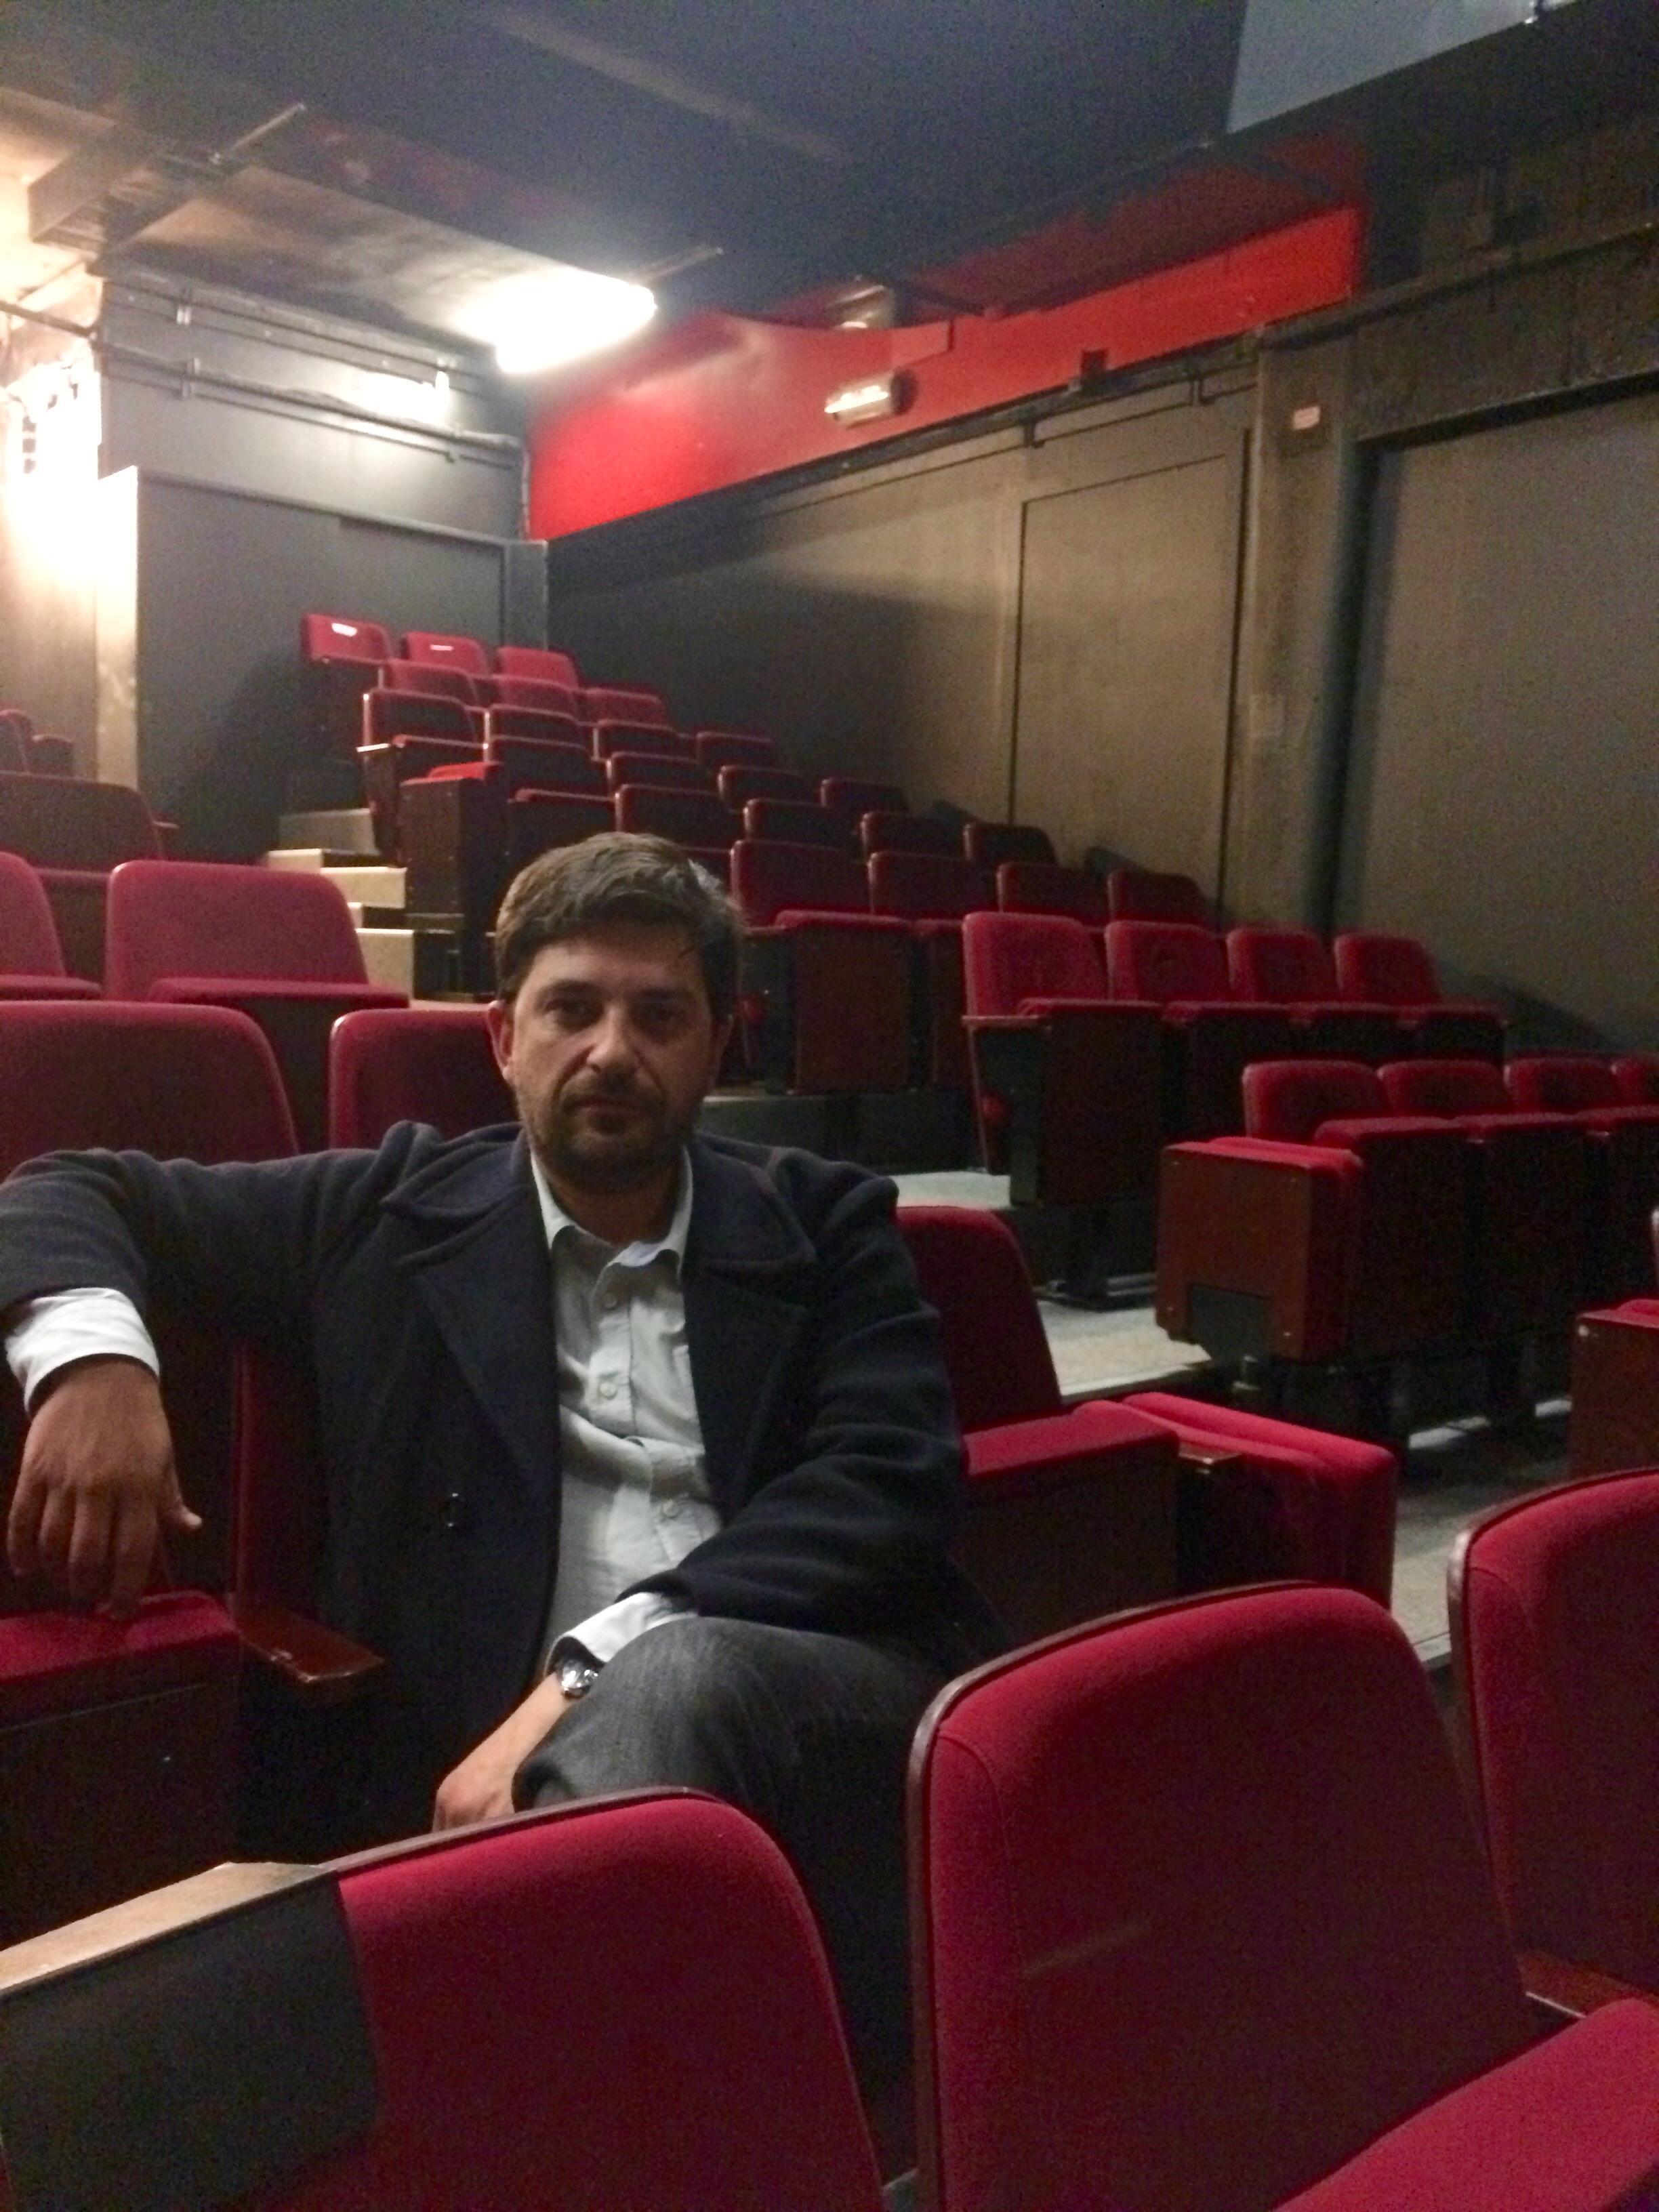 Encenador e director artístico do Teatro Nacional D.Maria II,Tiago Rodrigues